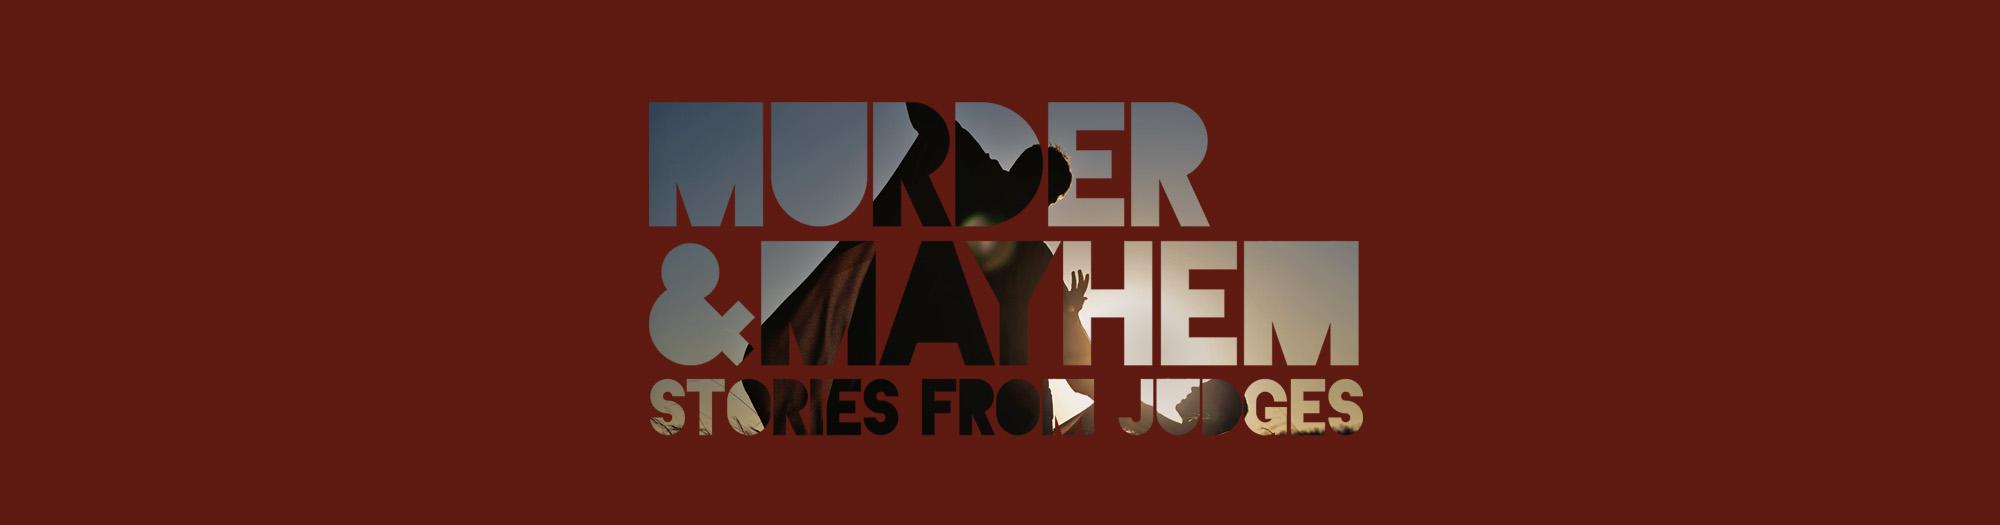 Murder and Mayhem - Web Header (2000x525)